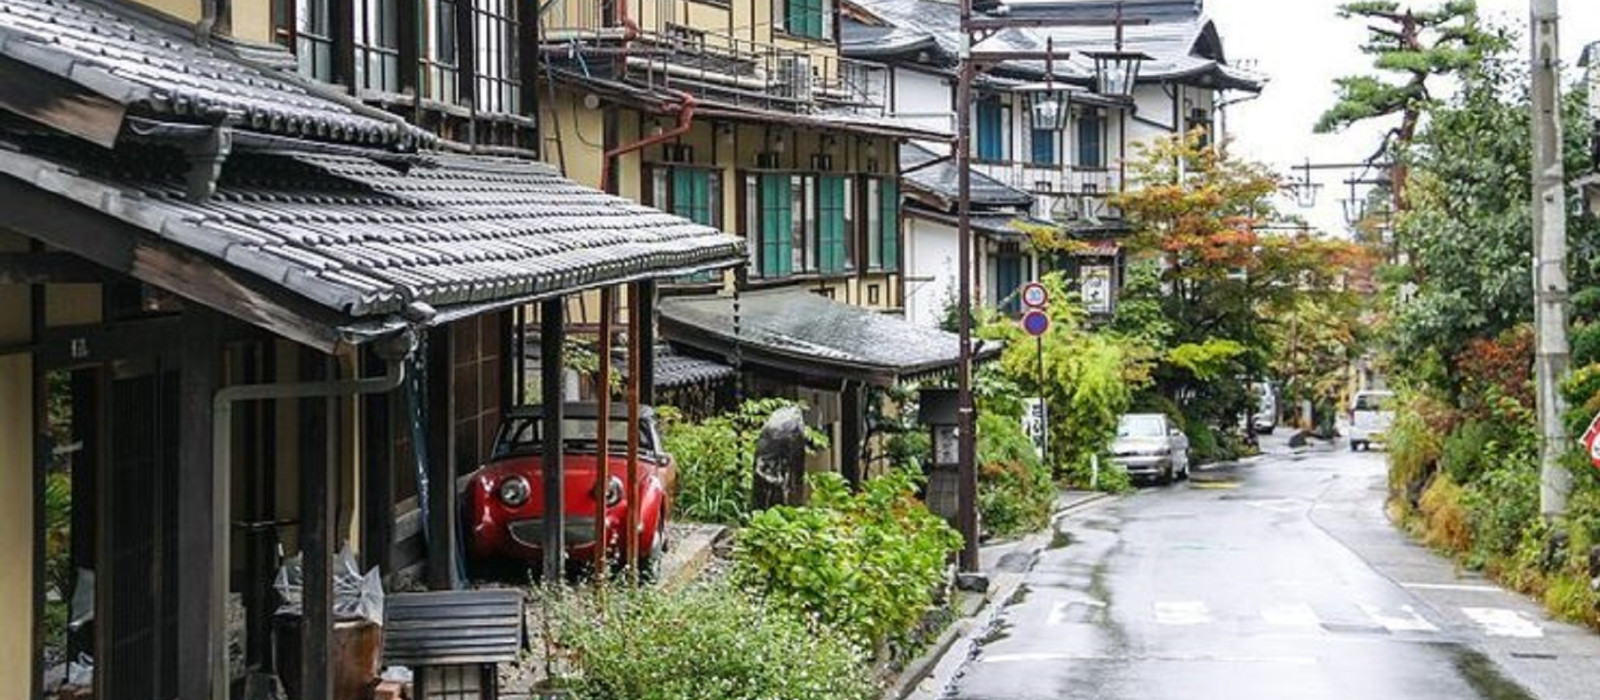 Reiseziel Yudanaka Onsen Japan